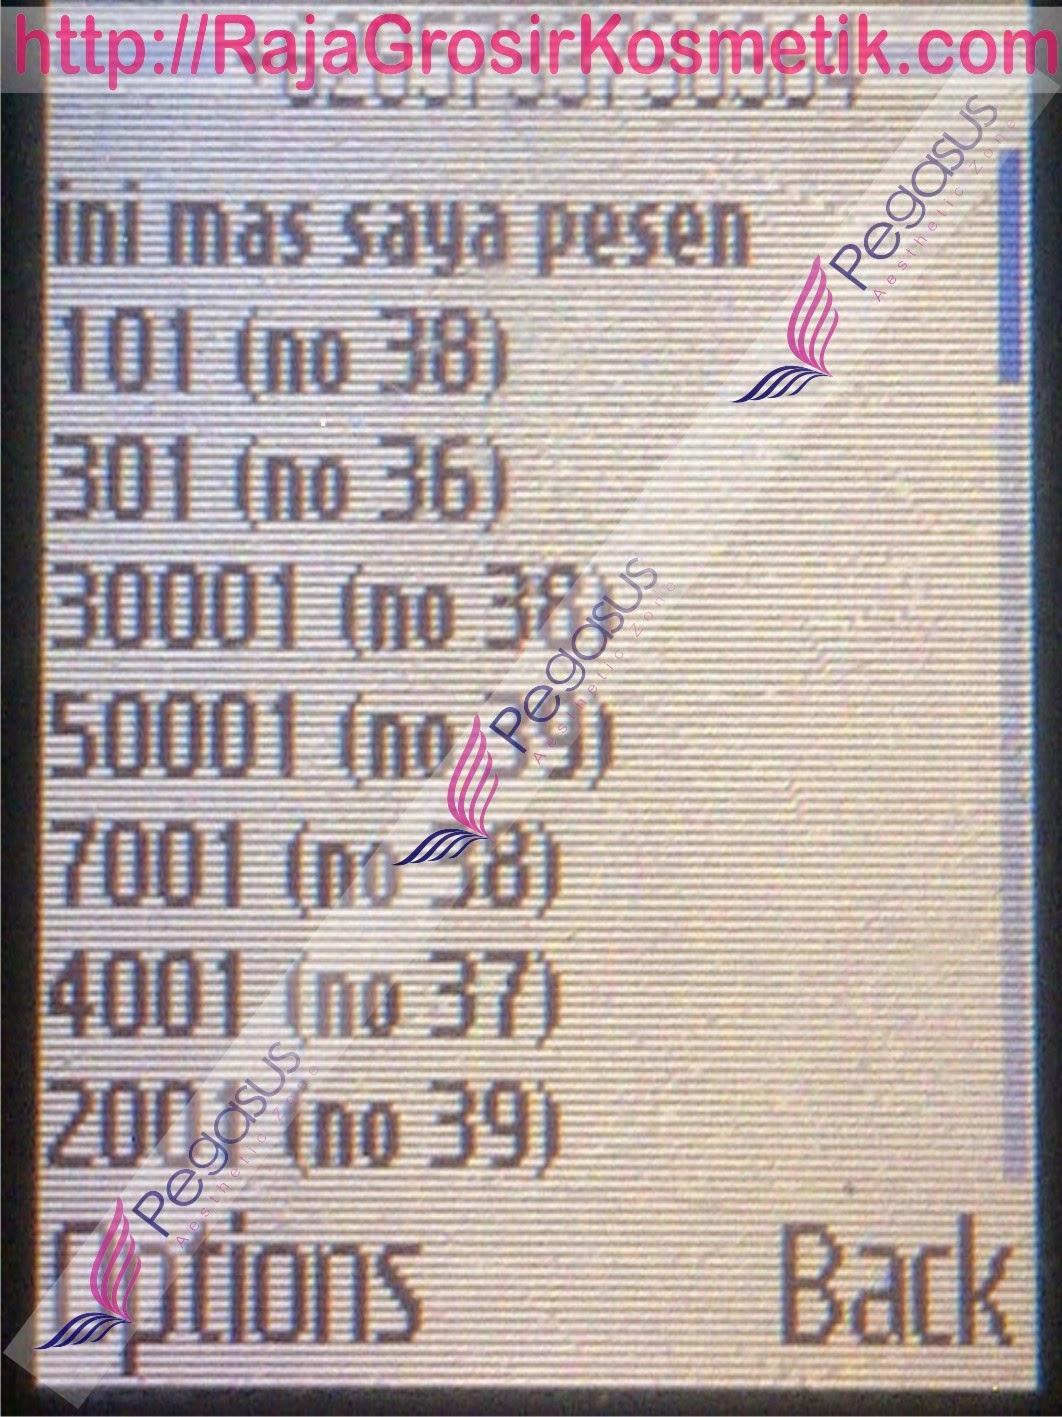 Grosir Sepatu Bordir Murah, Sepatu Bordir Bangil, Sepatu Bordir Bali, +62.8564.993.7987